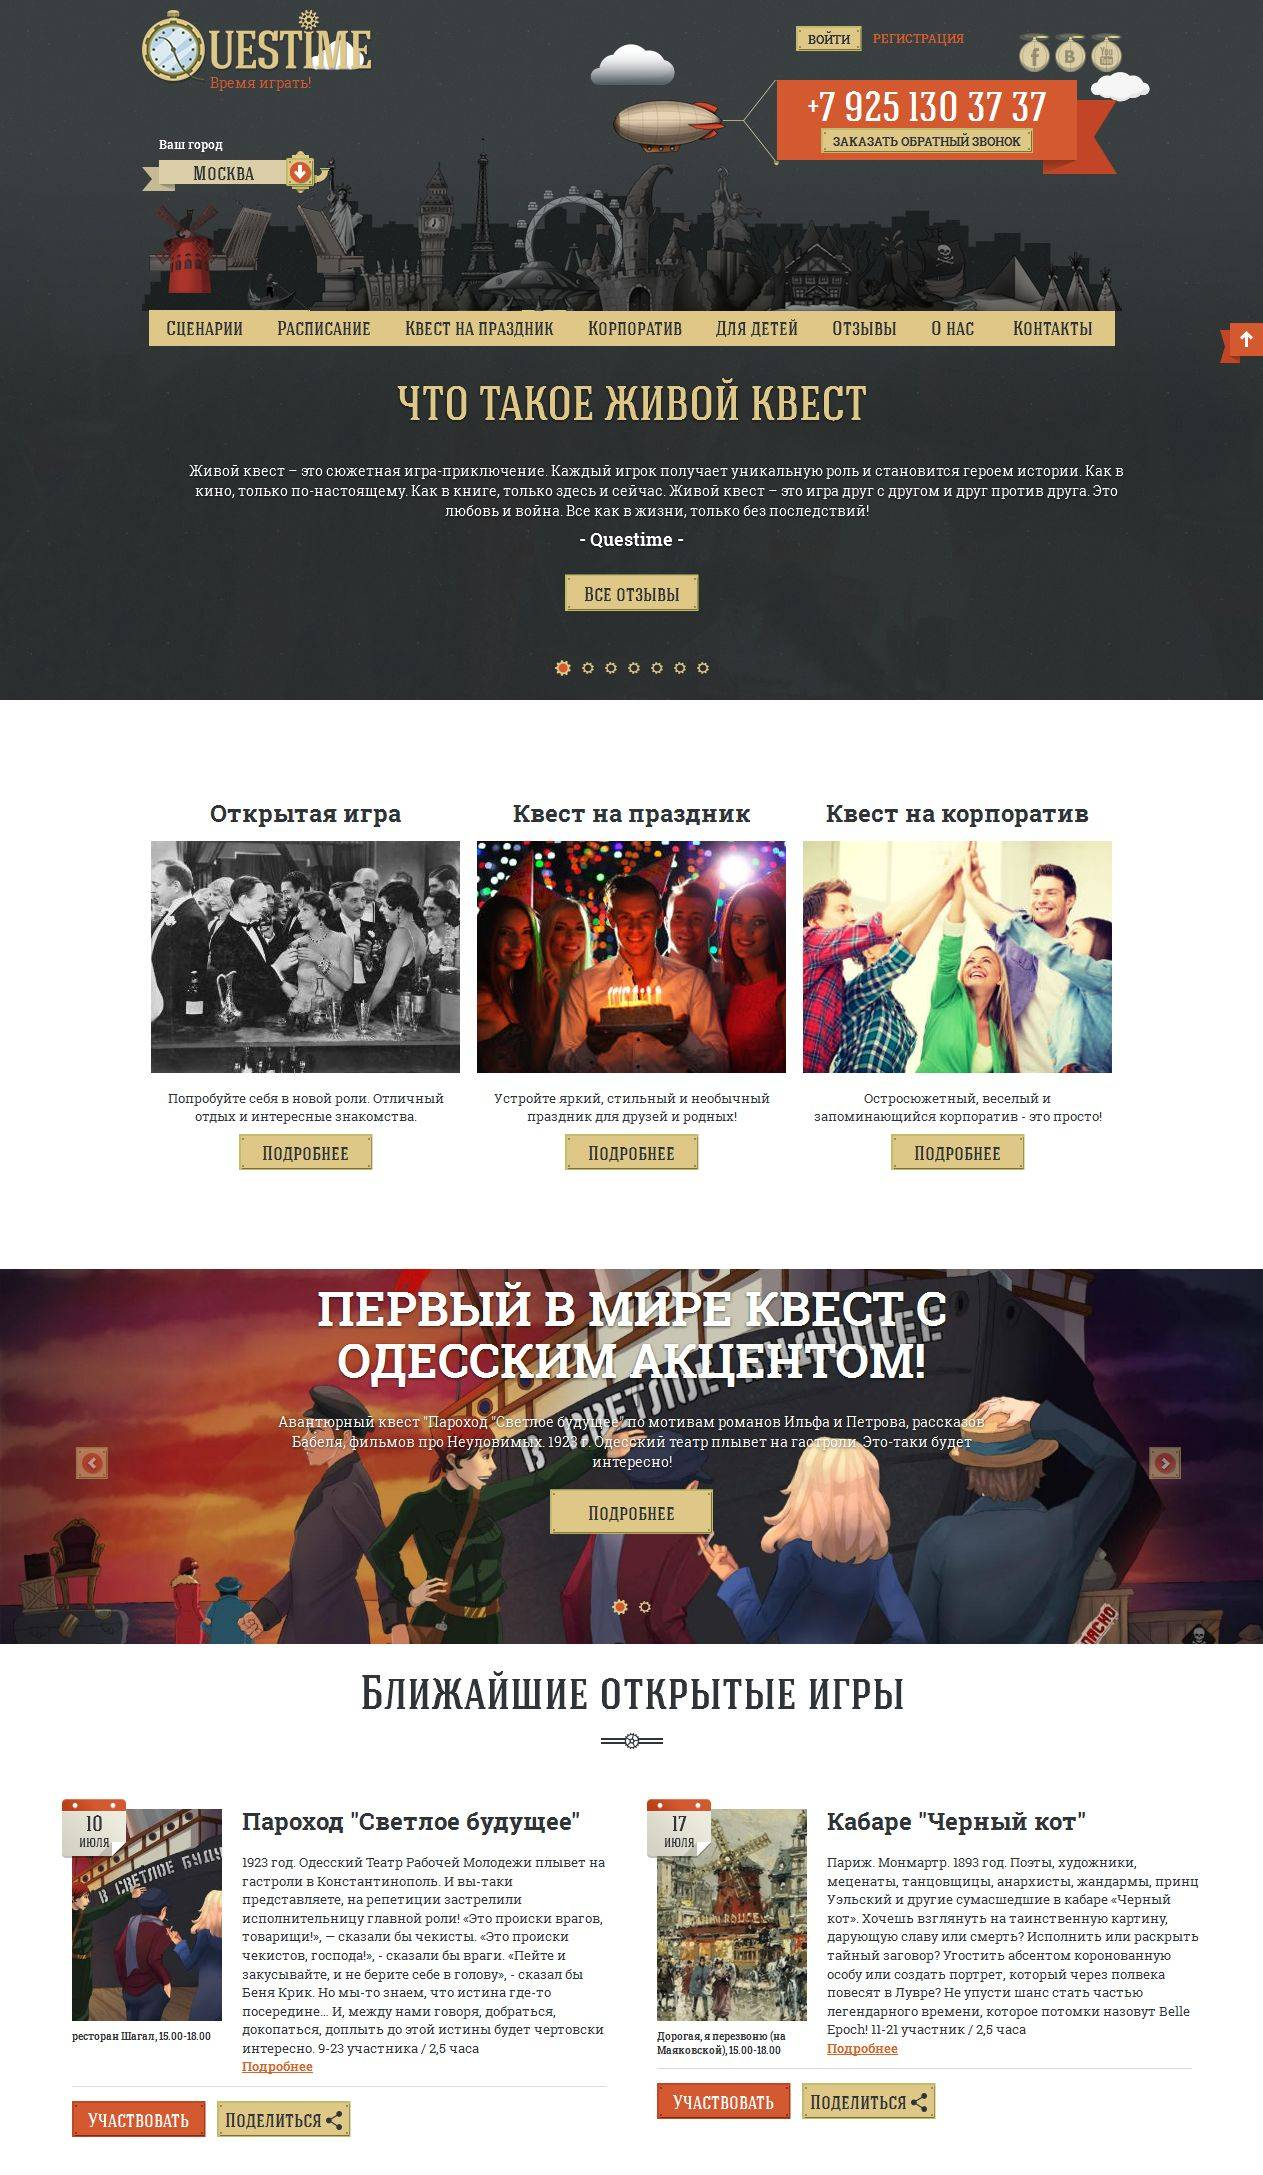 Questime.ru - живые квесты